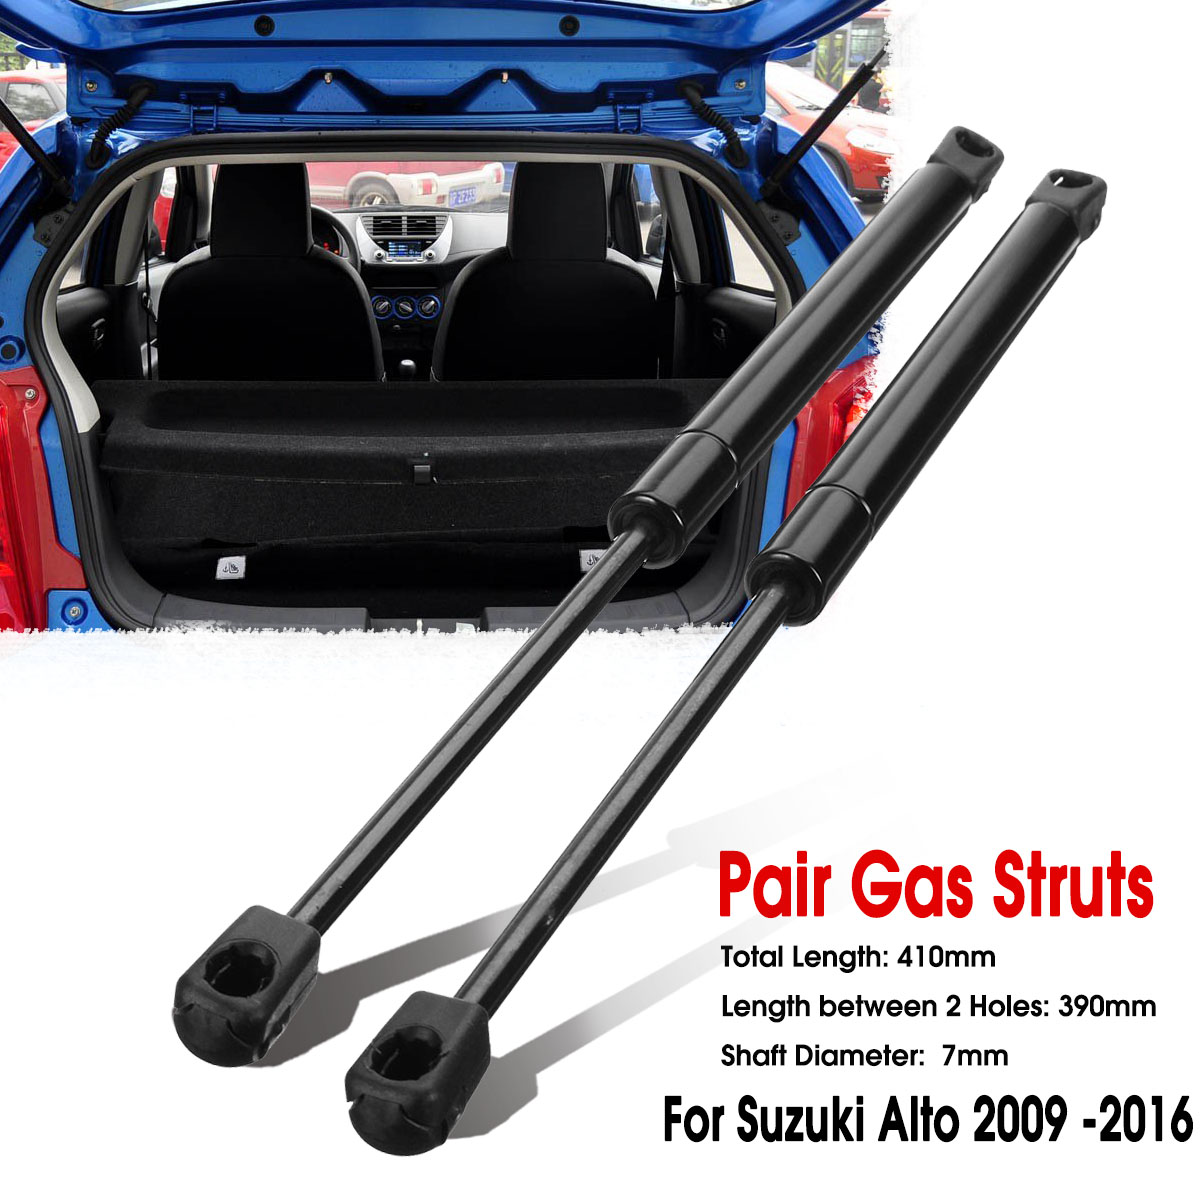 2 adet araba arka bagaj kapağı bagaj gaz lifti desteği Struts bar Suzuki Alto için HA25 HA35 2009 2010 2011 2012 2013 2014 2015 2016